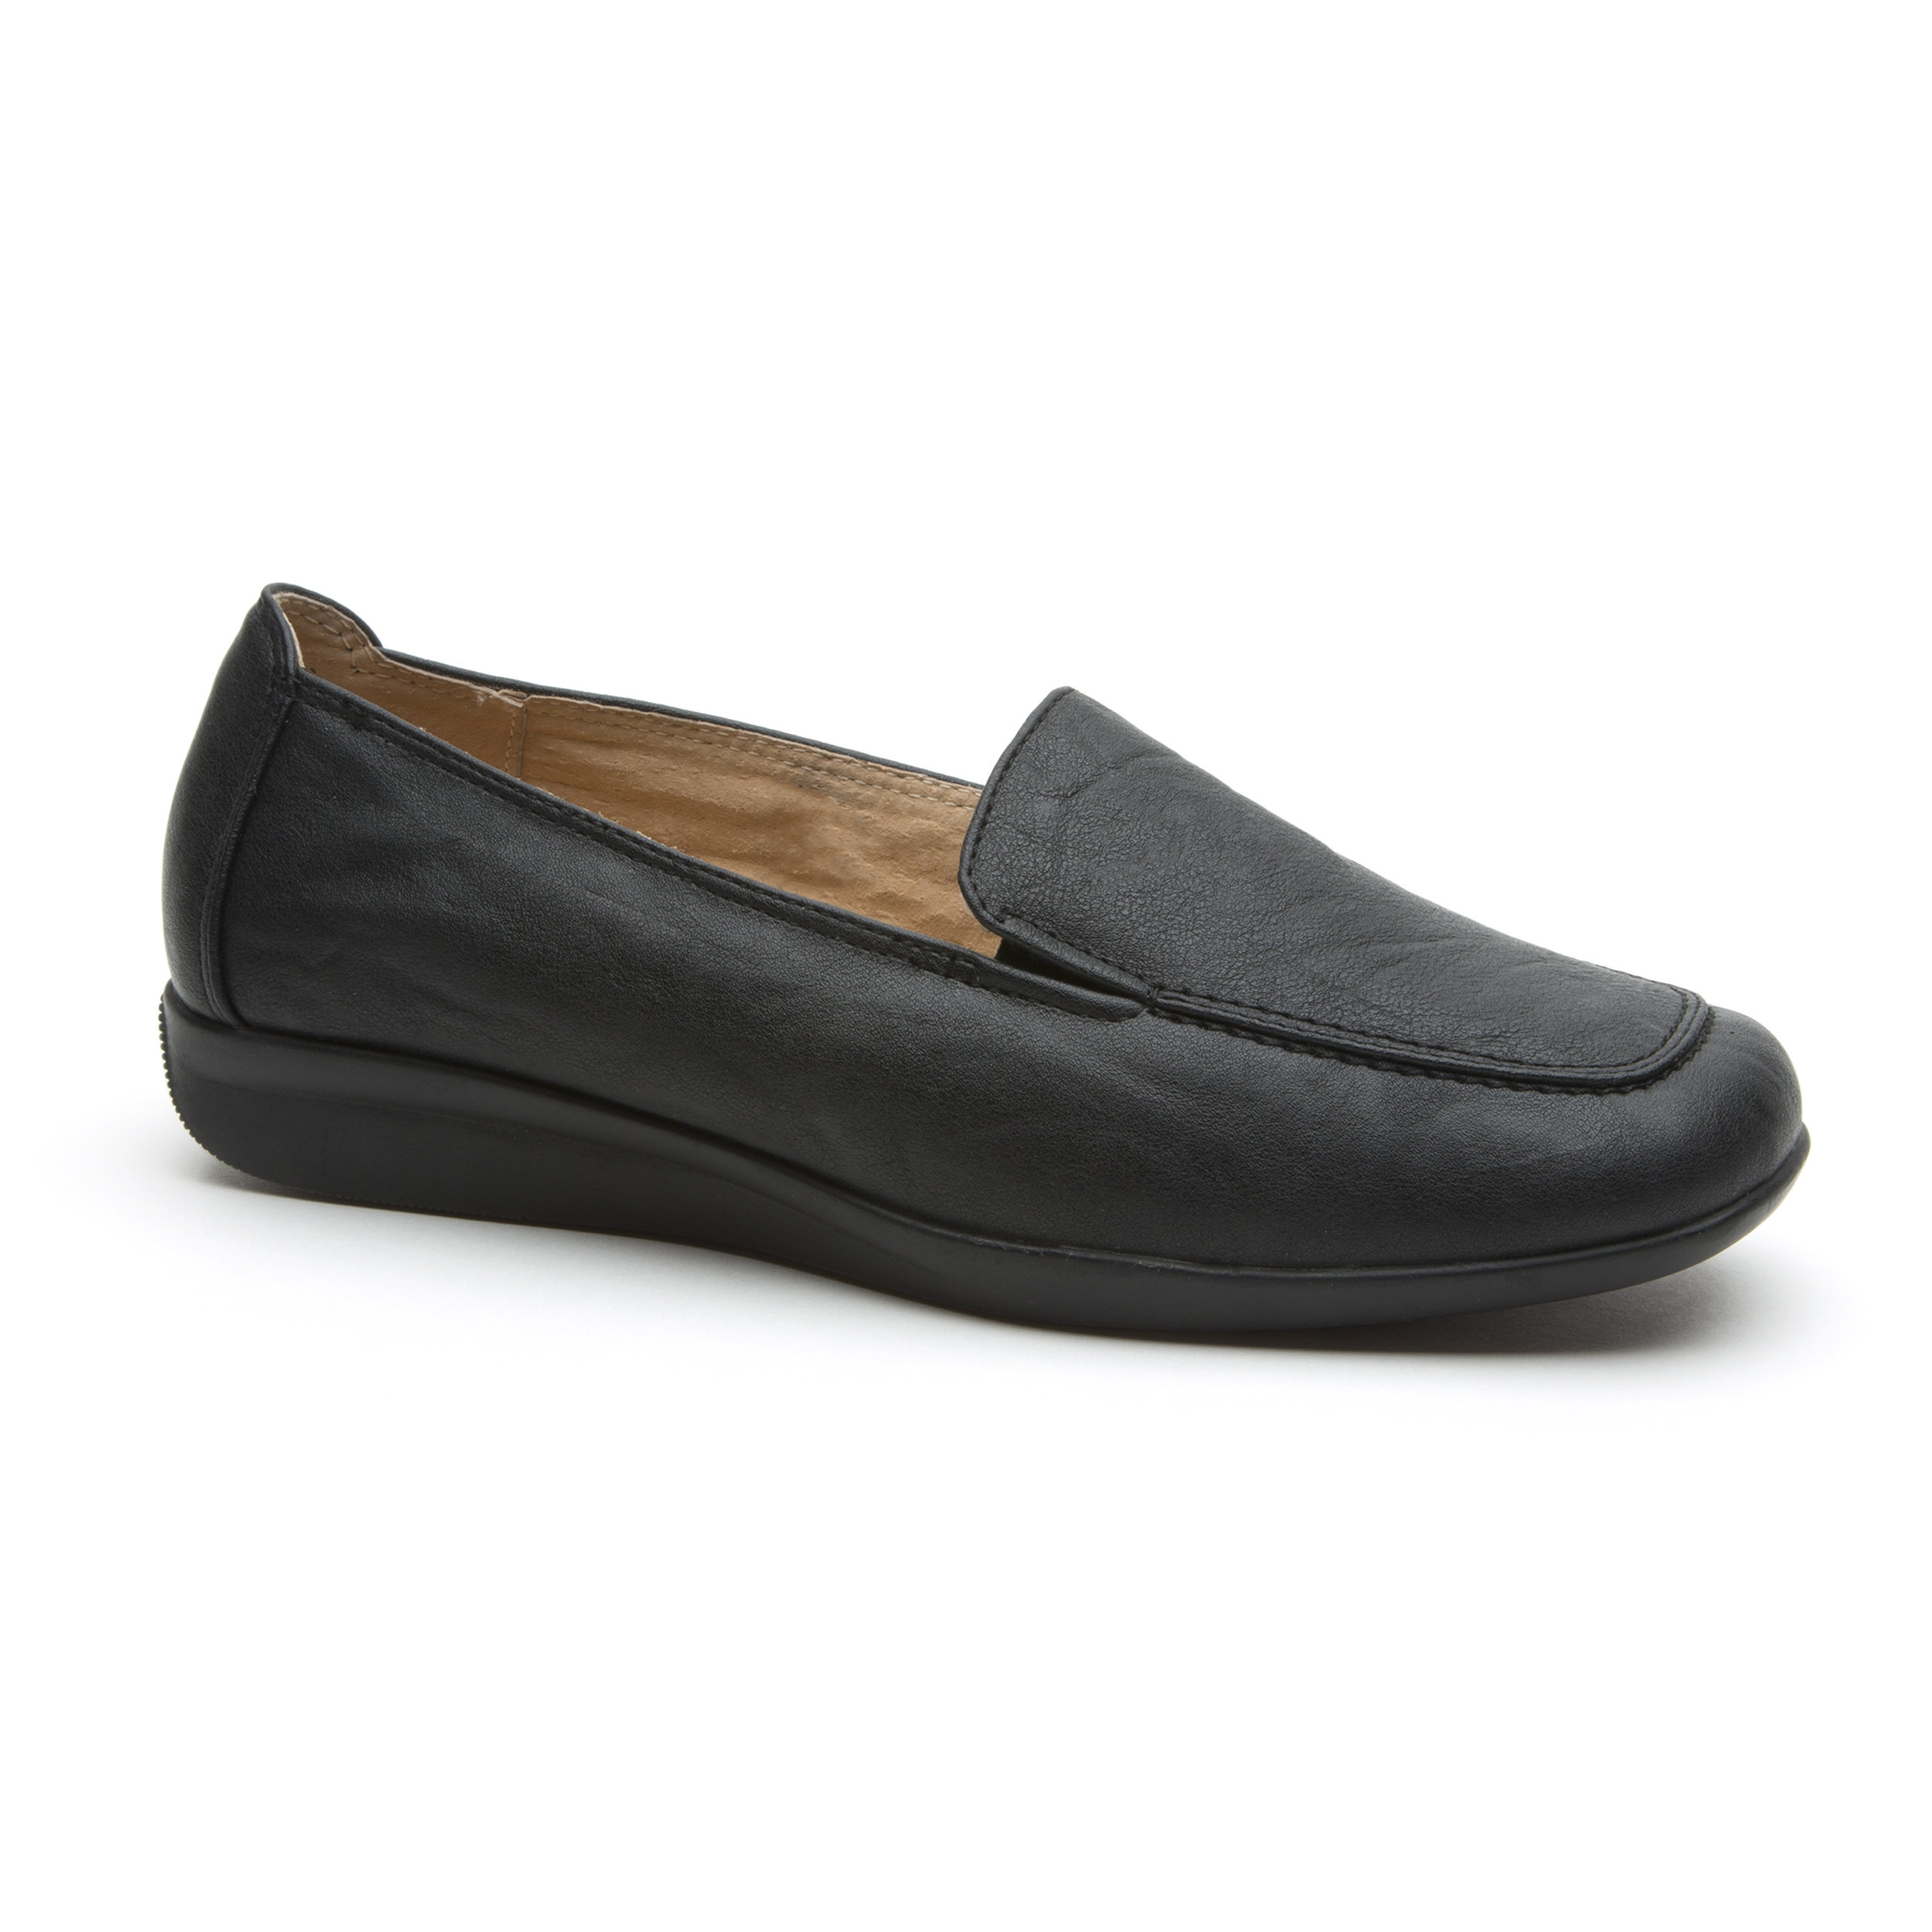 capezio nasar comfort shoes qzpndzs